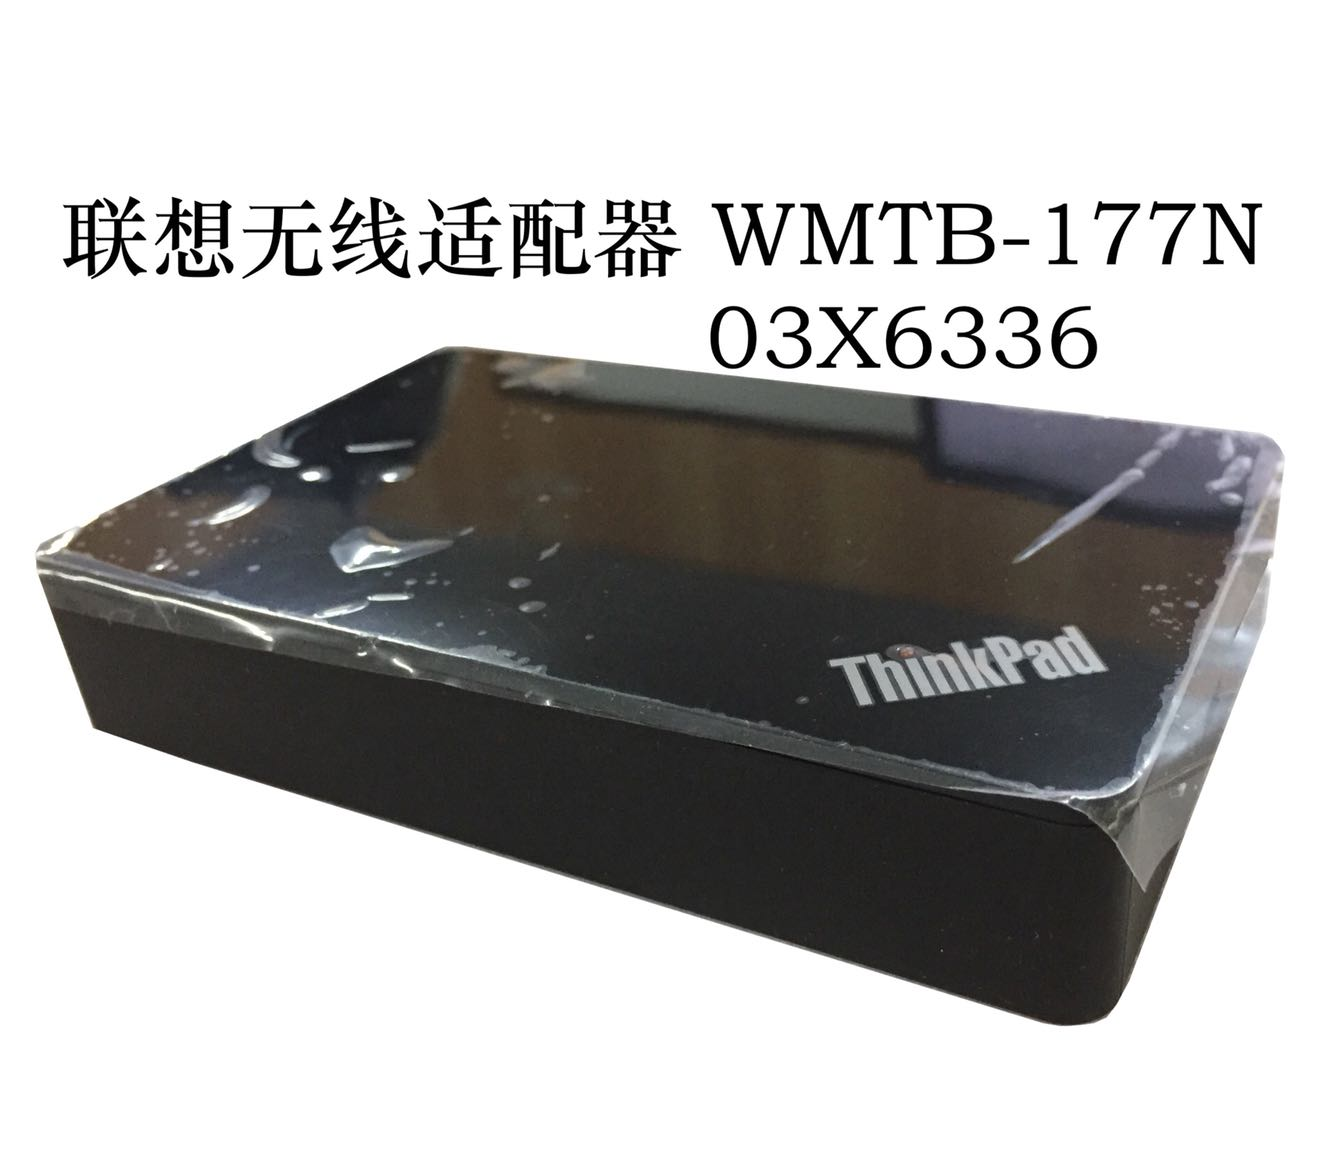 Lenovo ThinkpadVGAHDMI HD WiFi беспроводной адаптер дисплея с экрана устройства WMTB-177N